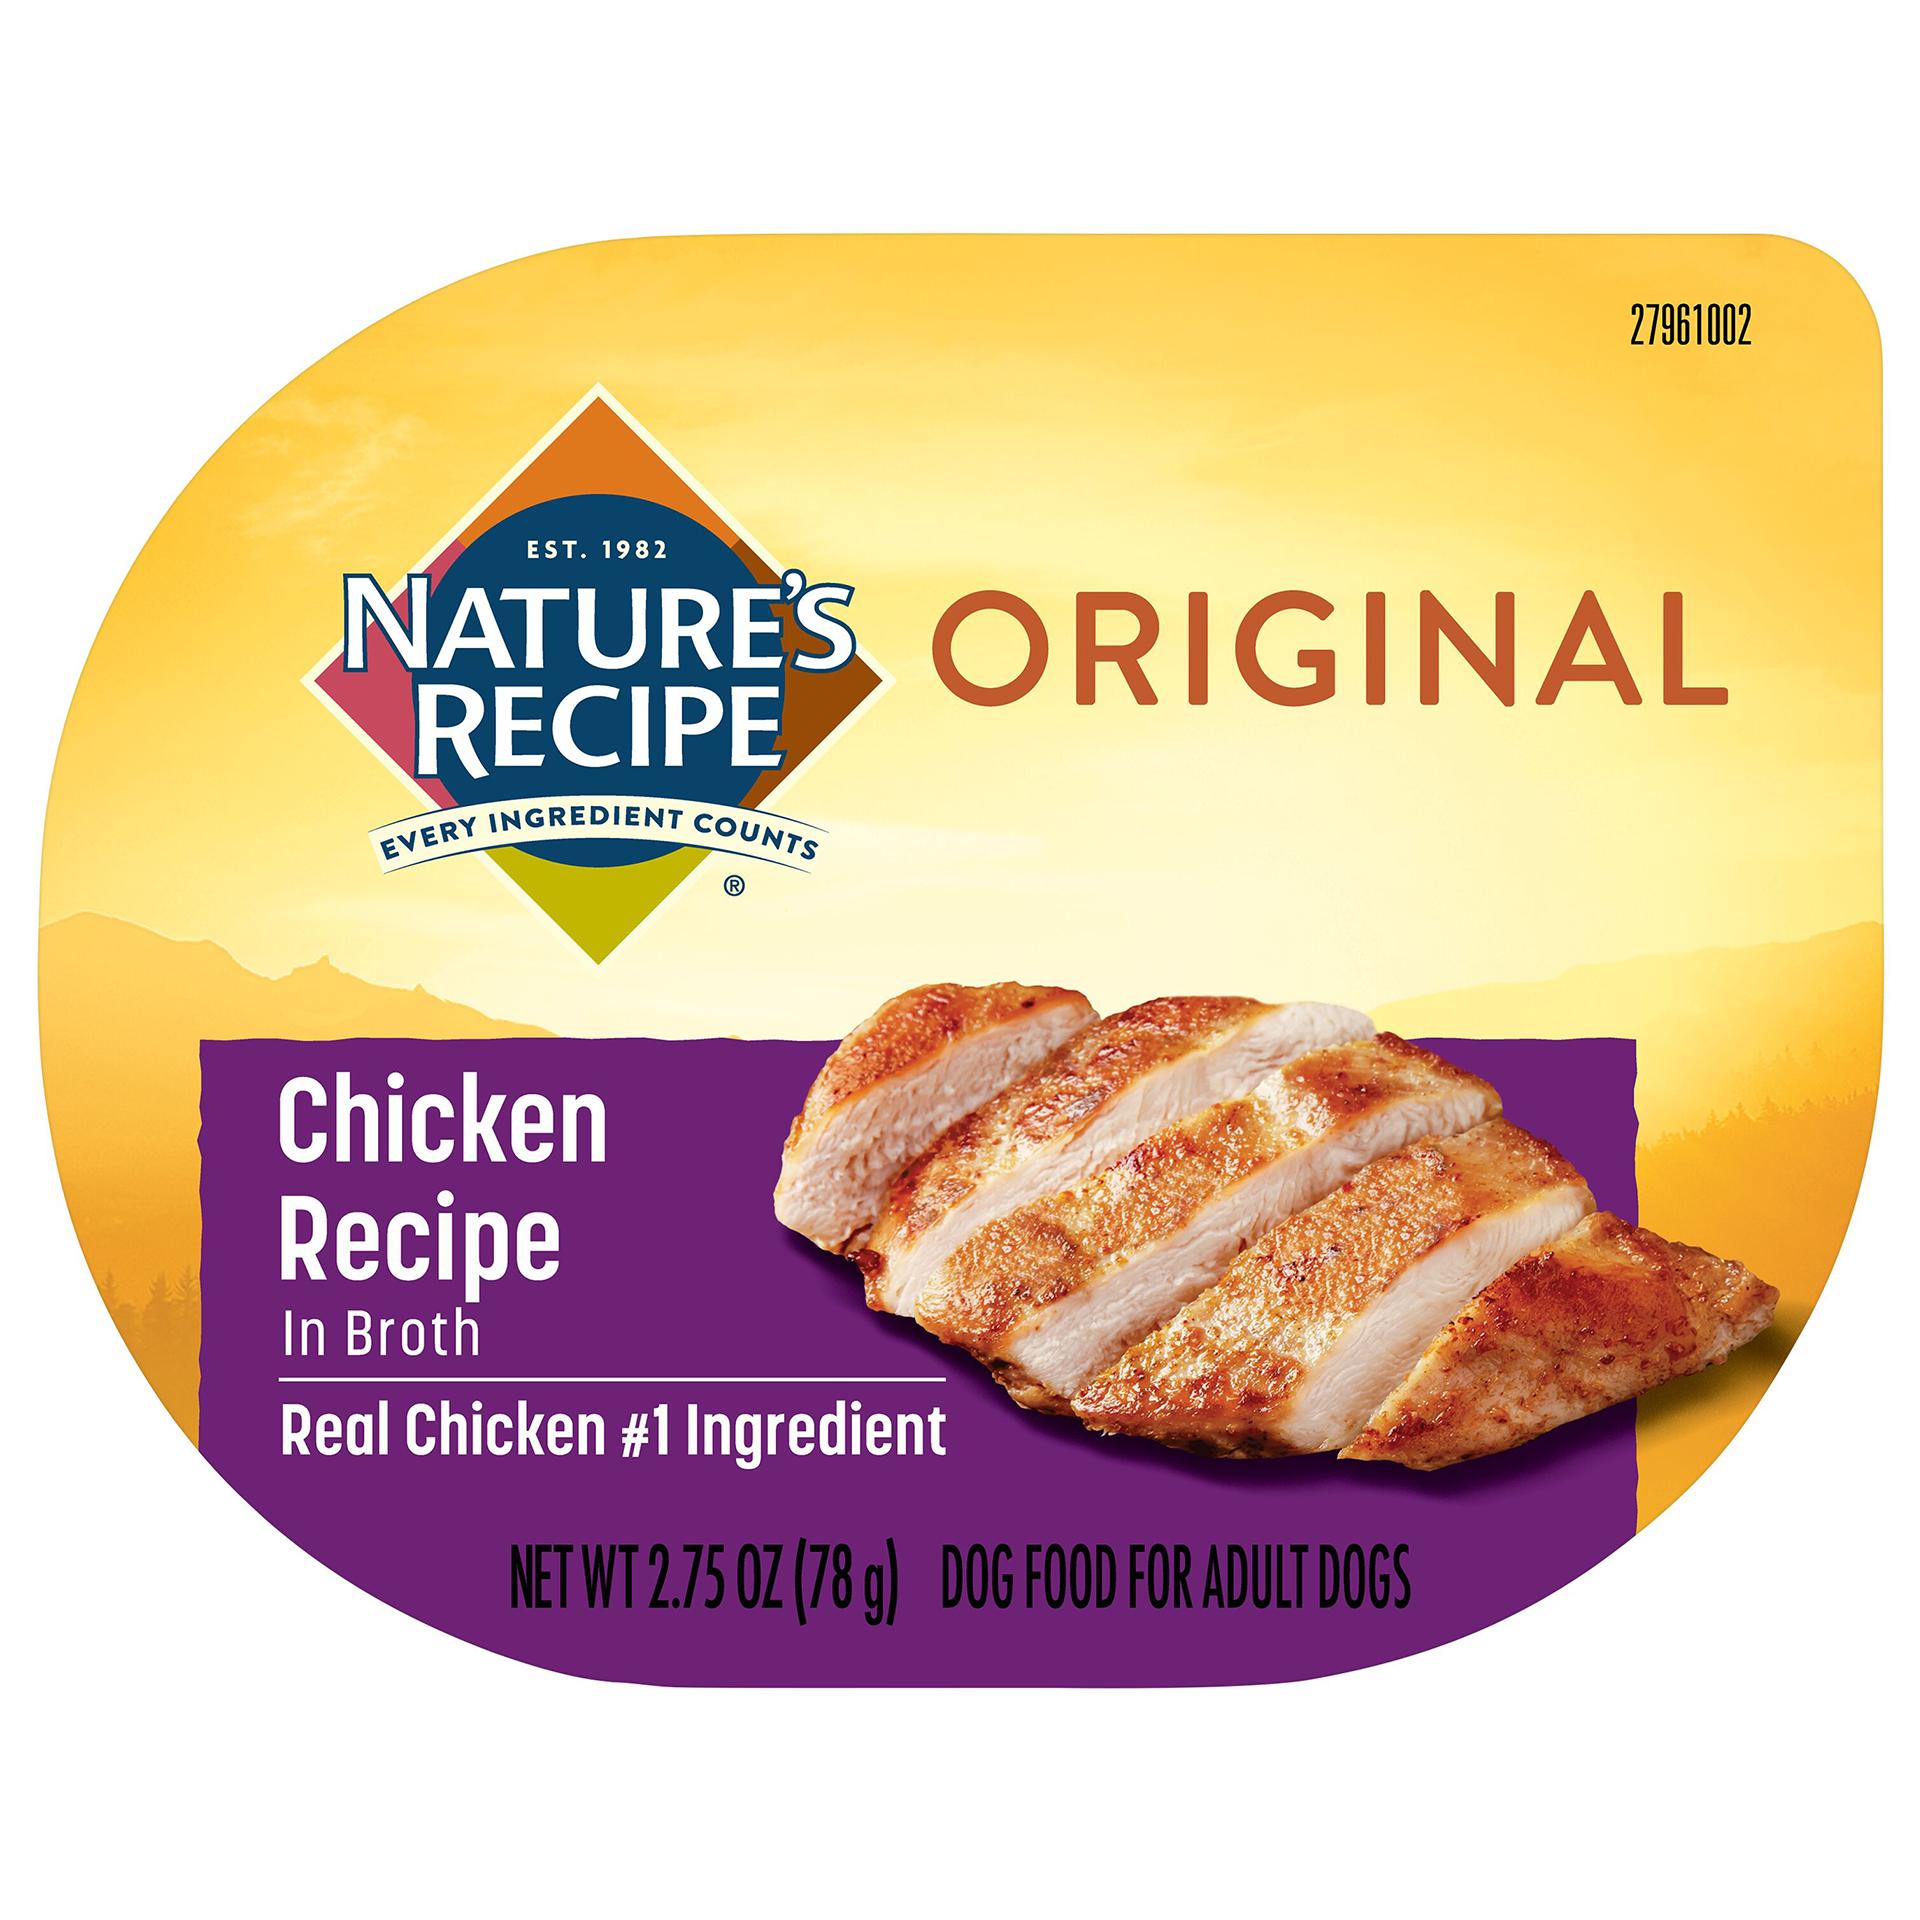 Chicken Recipe In Broth